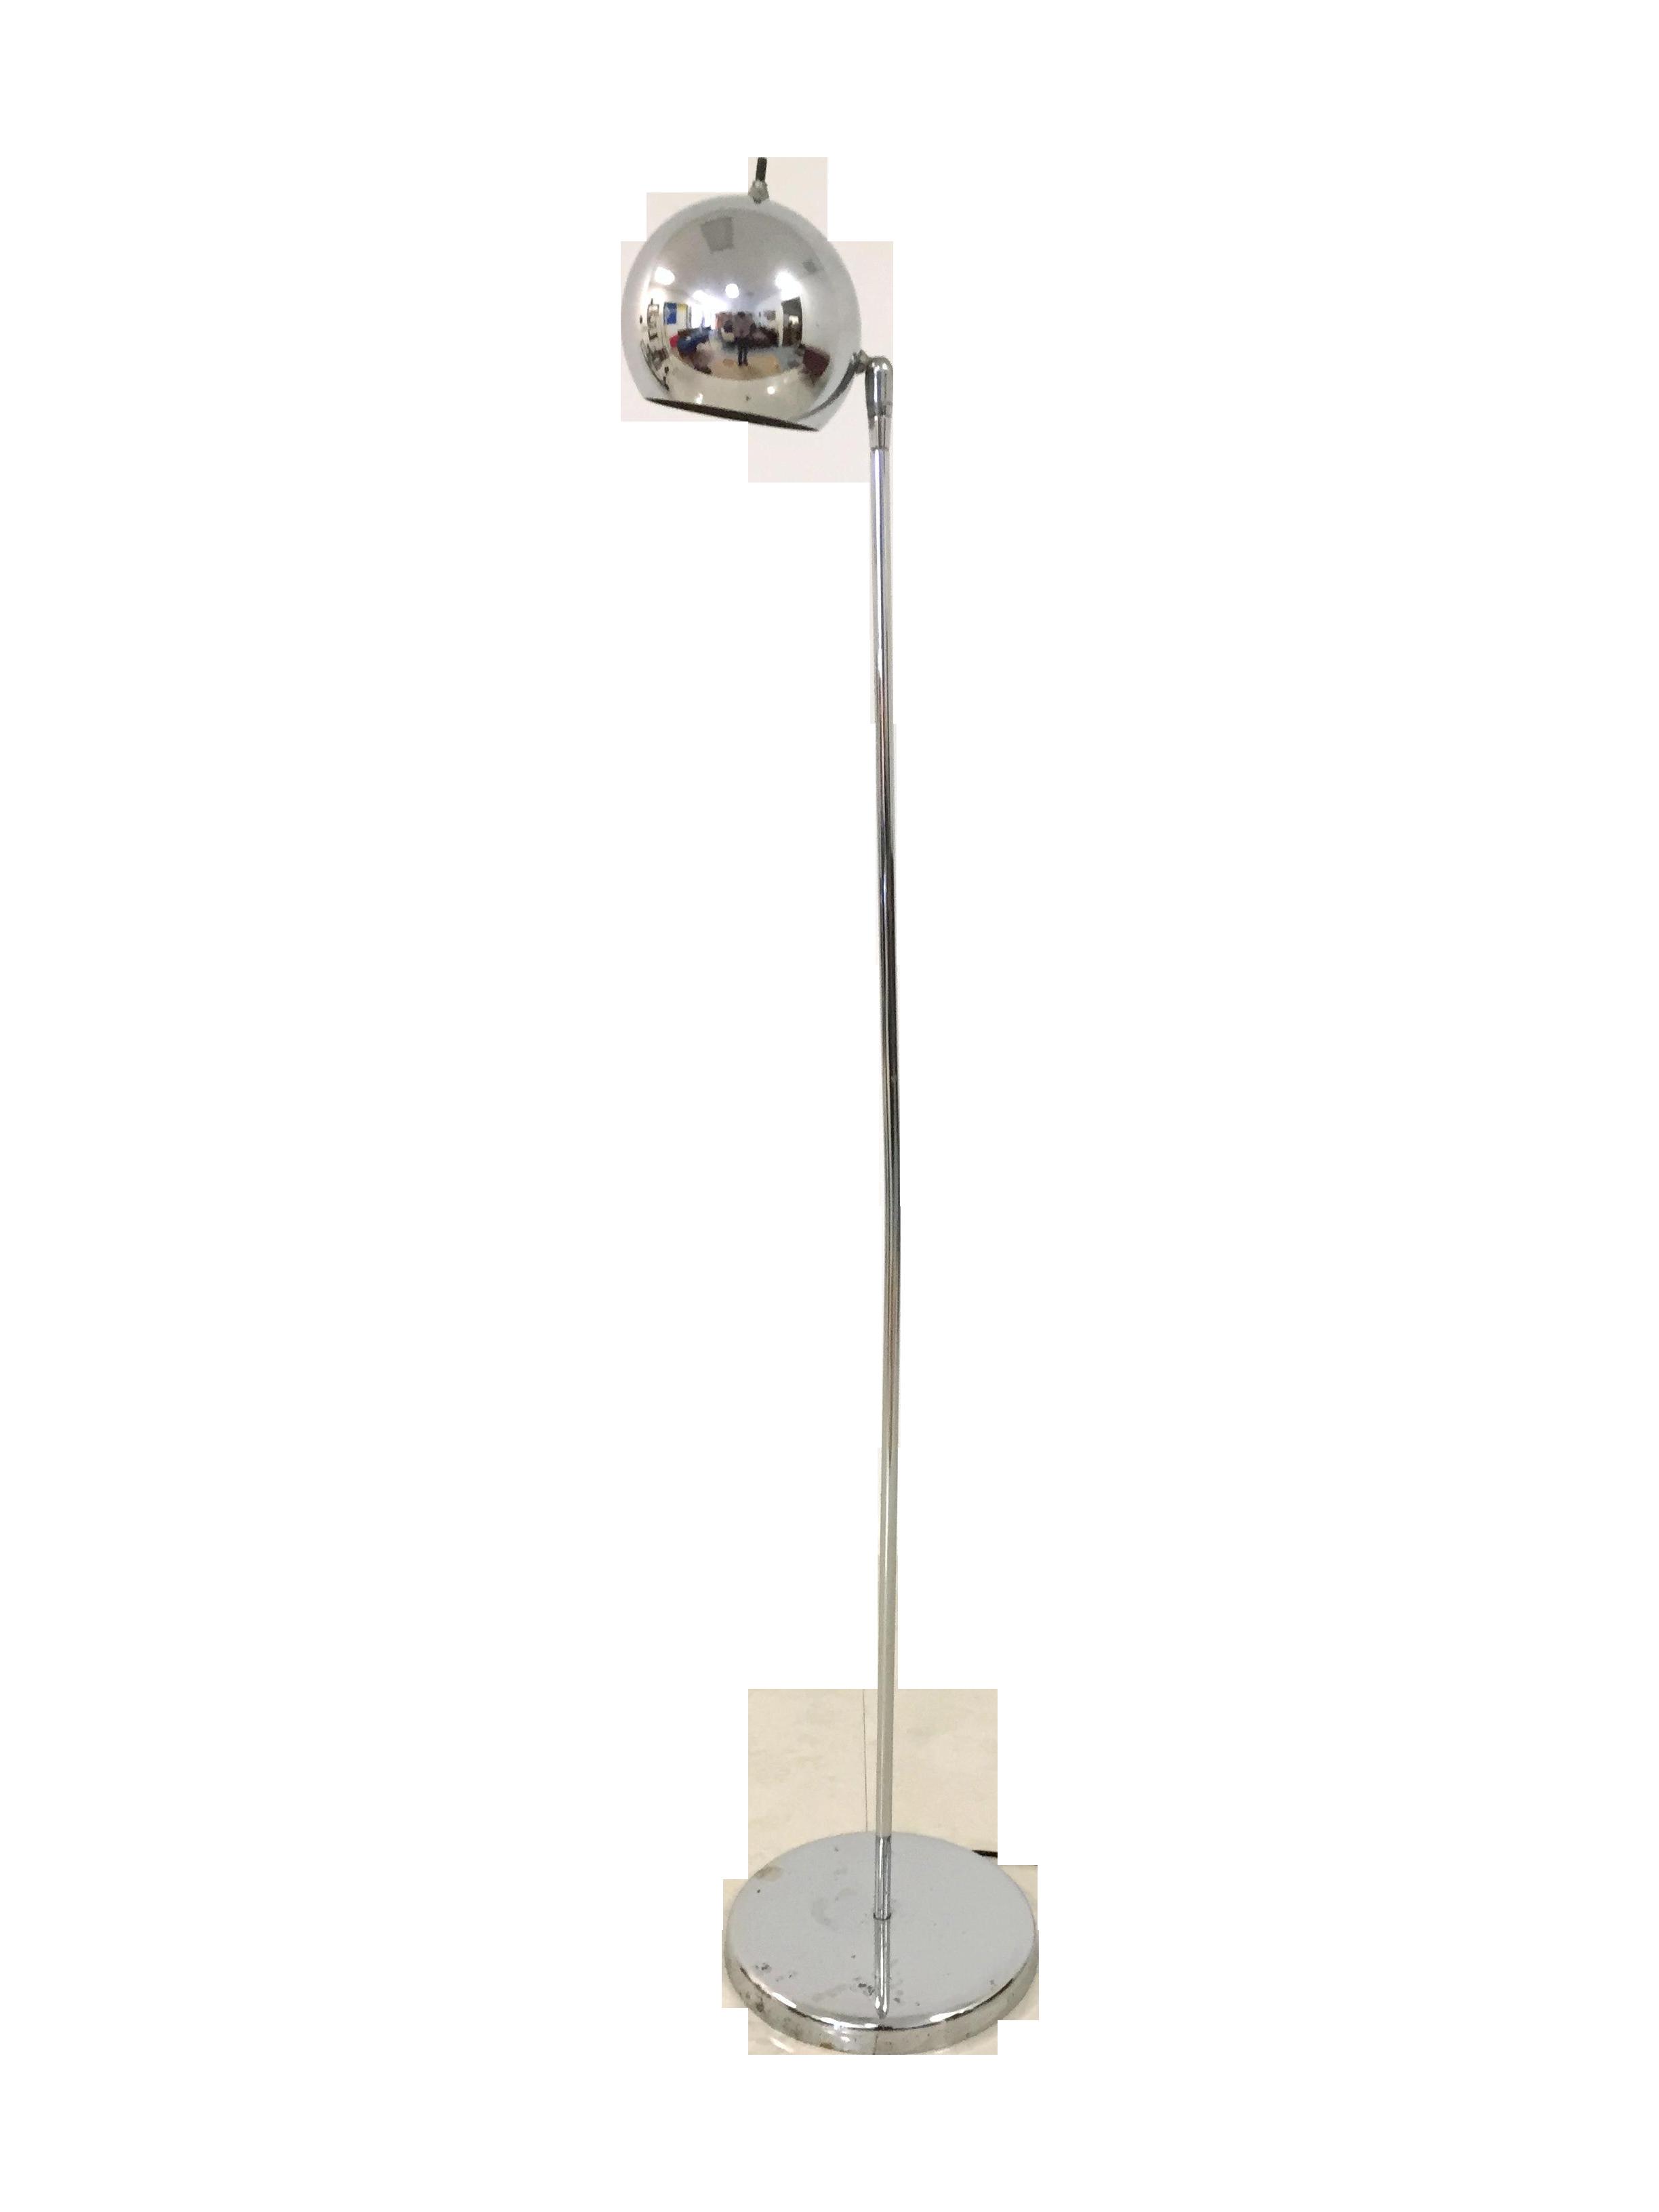 Vintage sonneman kovacs style chrome floor lamp chairish for Darlington floor lamp chrome